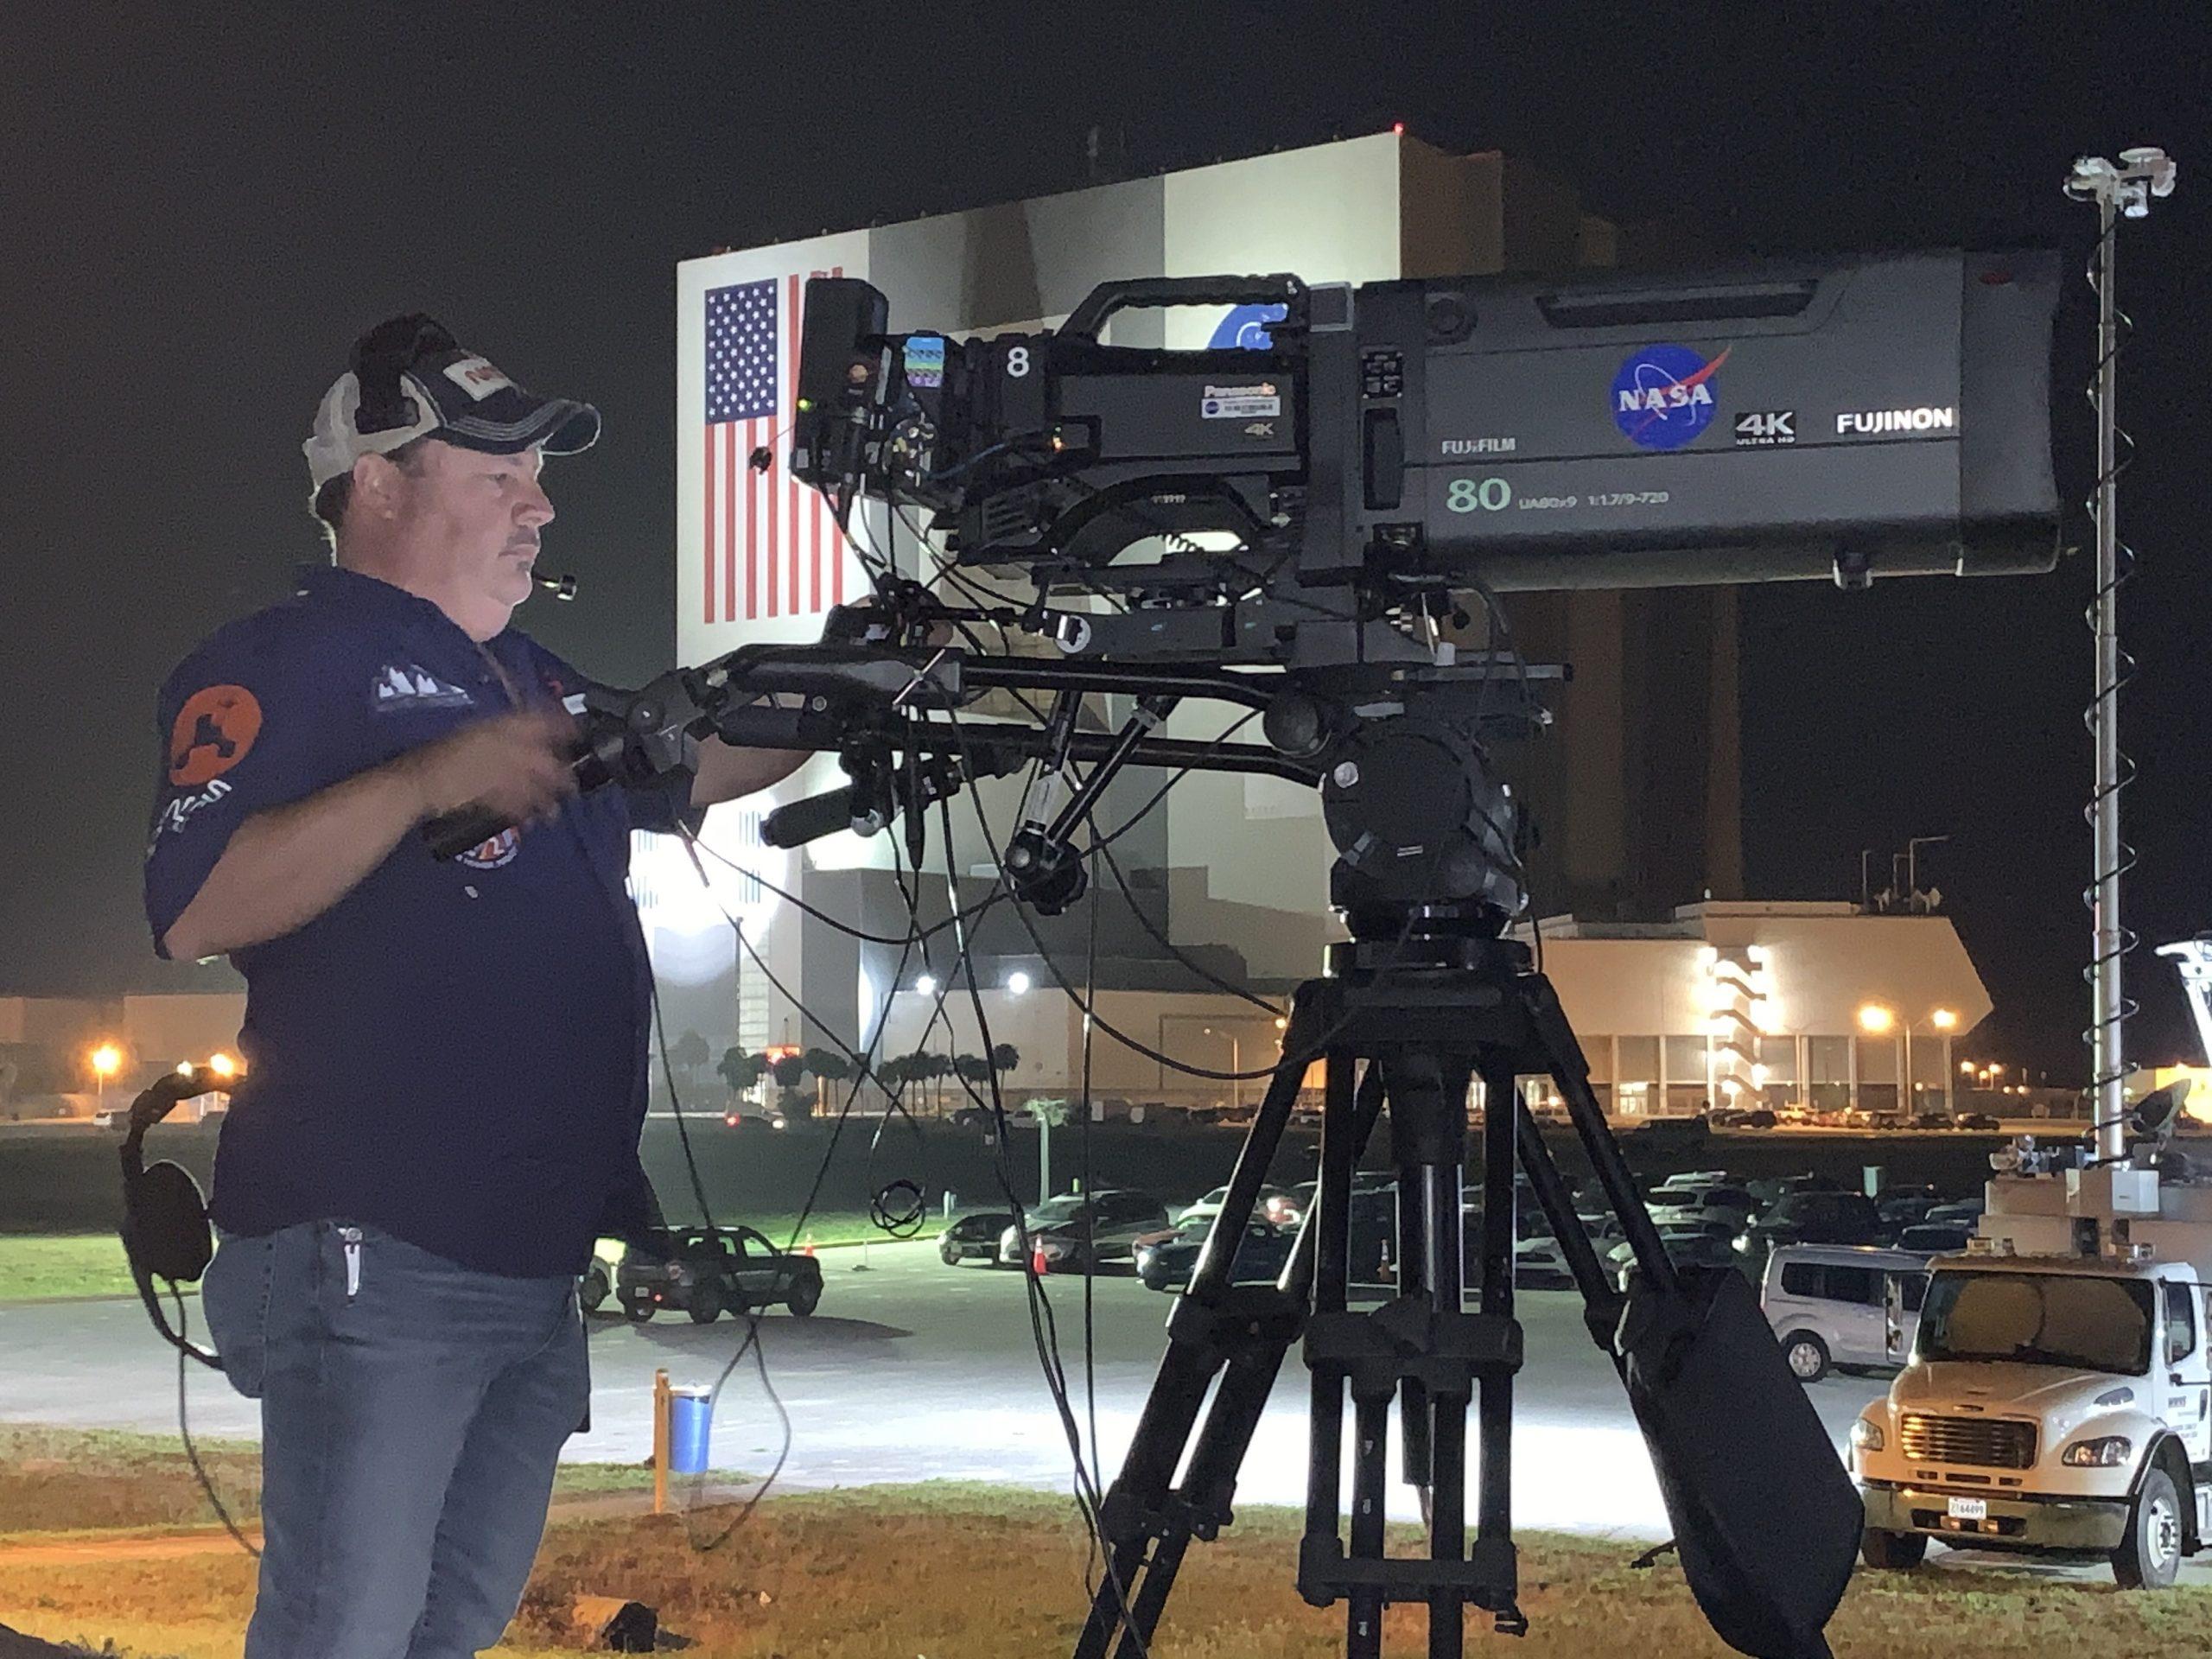 KSCTV personnel records a NASA launch broadcast at the NASA News Center.